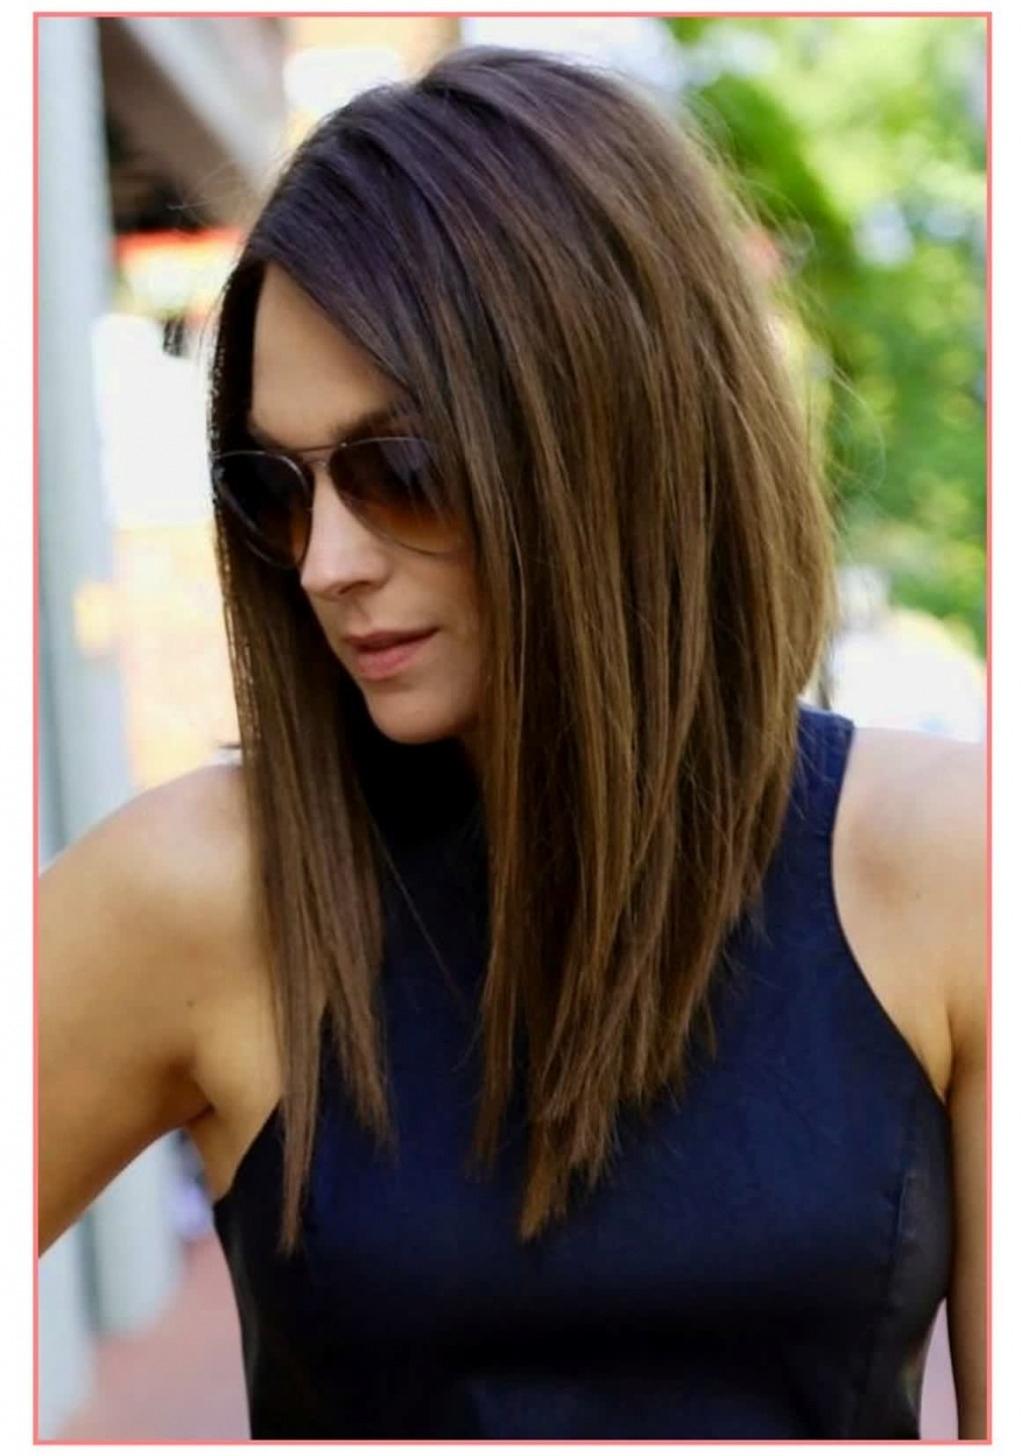 Medium Hairstyles For Women 2018 Amazing Hair Ideas Medium Length throughout Haircut 2018 Female Medium Length